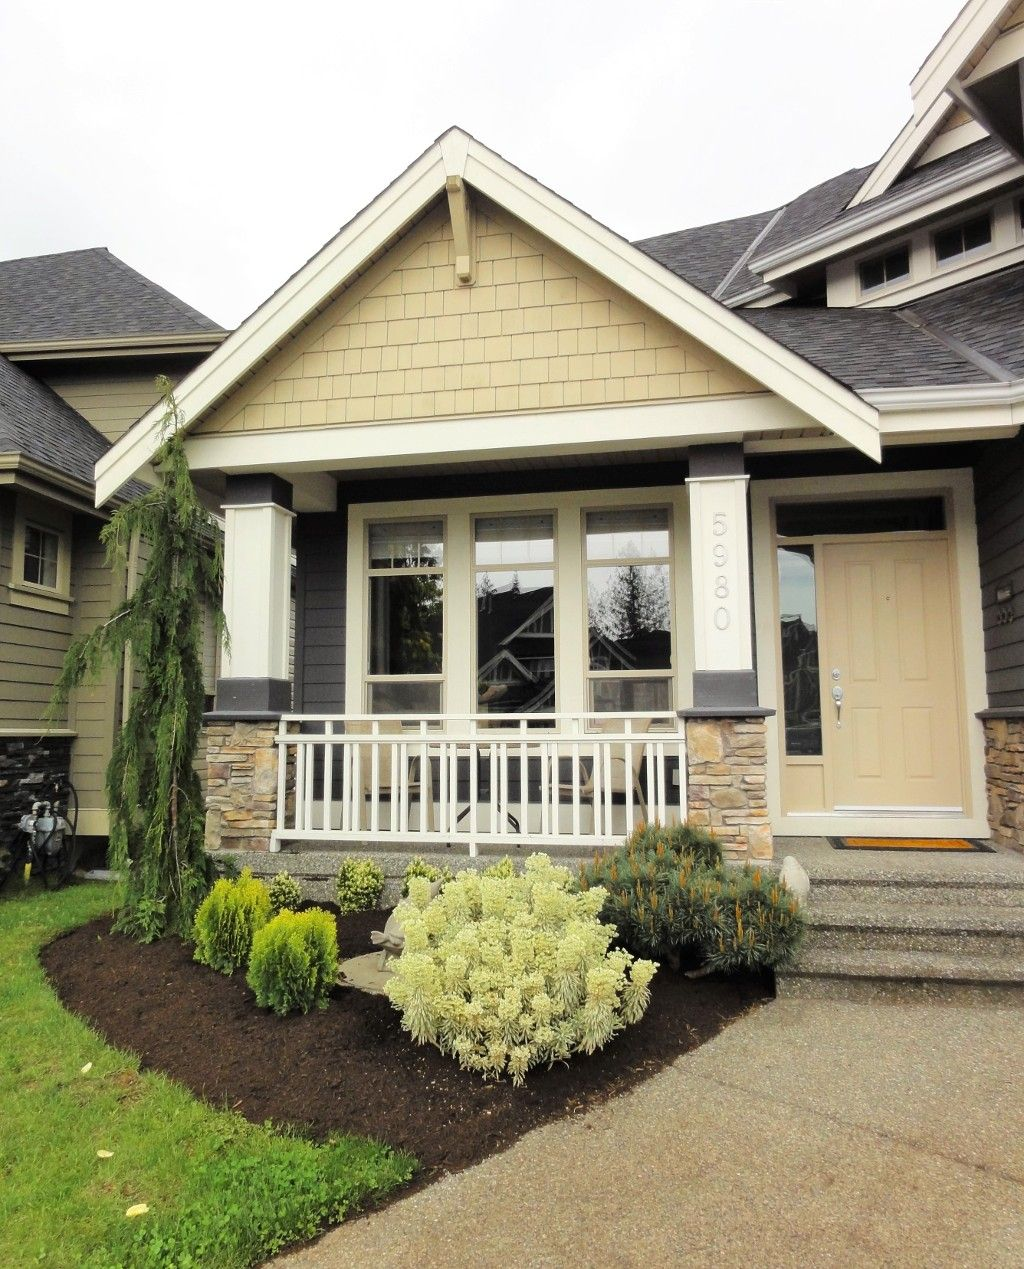 "Photo 2: Photos: 5980 163B Street in Surrey: Cloverdale BC House for sale in ""WESTRIDGE ESTATES"" (Cloverdale)  : MLS®# R2057890"